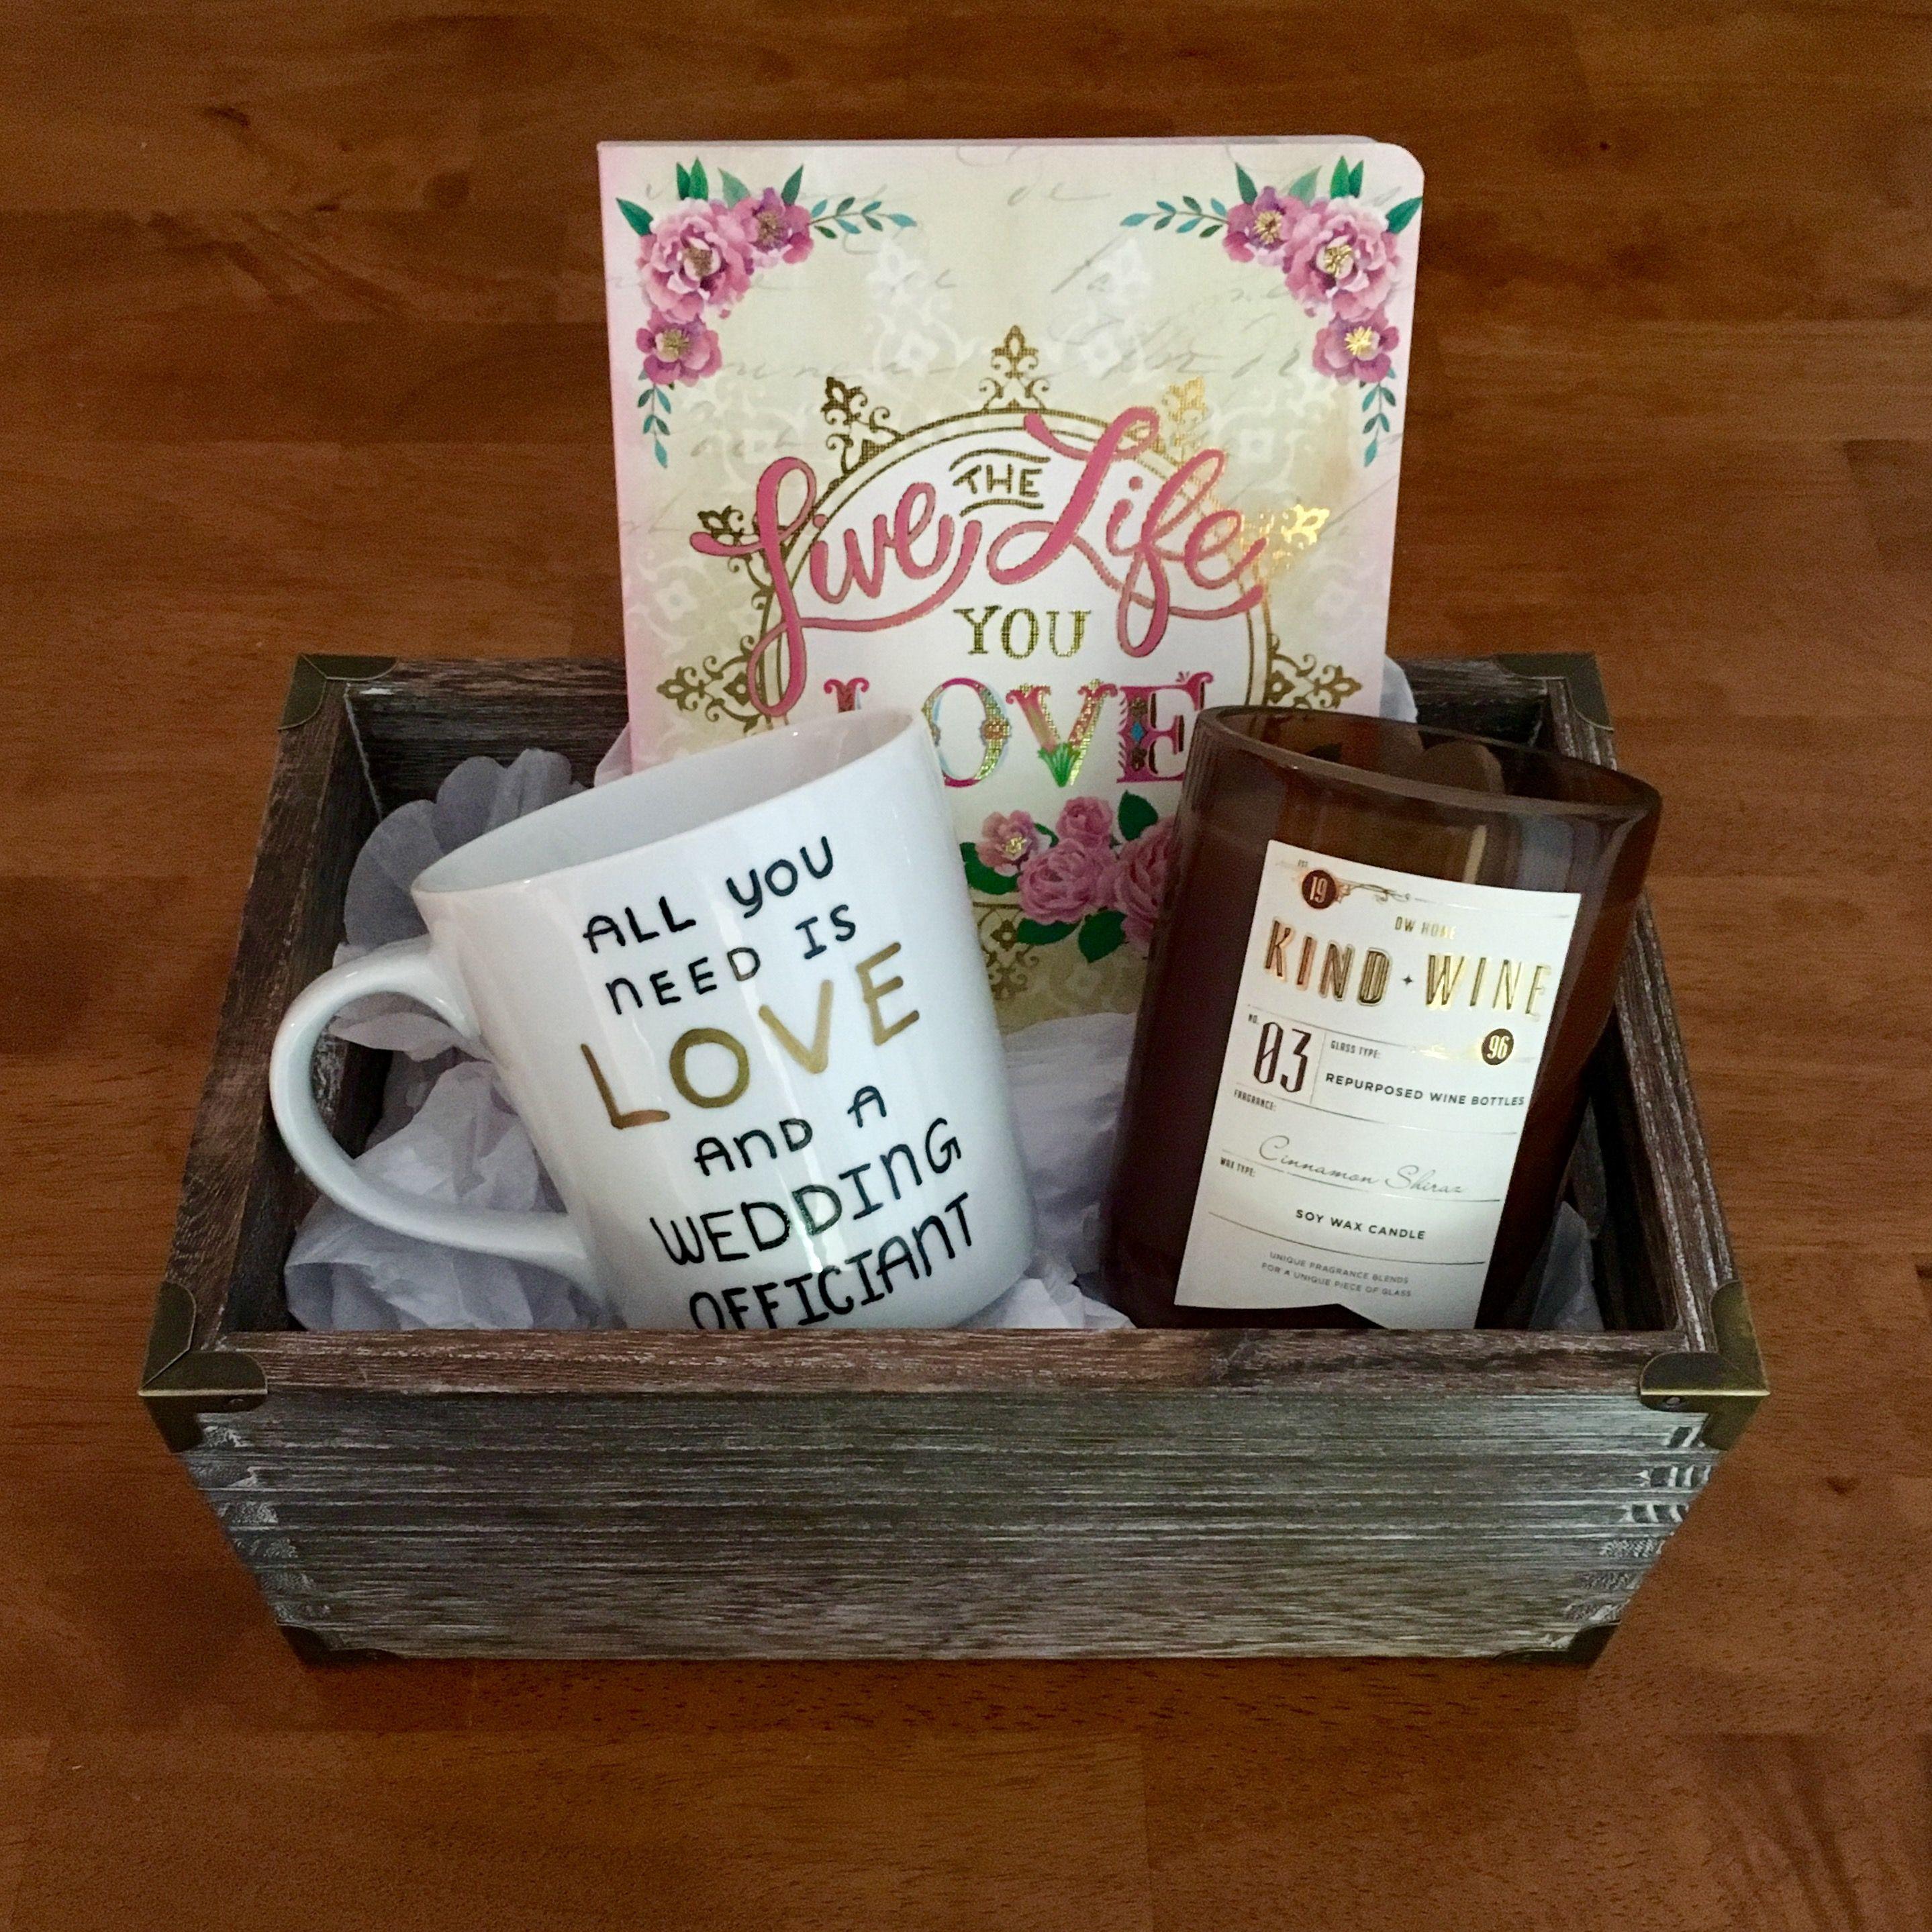 Officiant Gift Wedding officiant gift, Wedding officiant